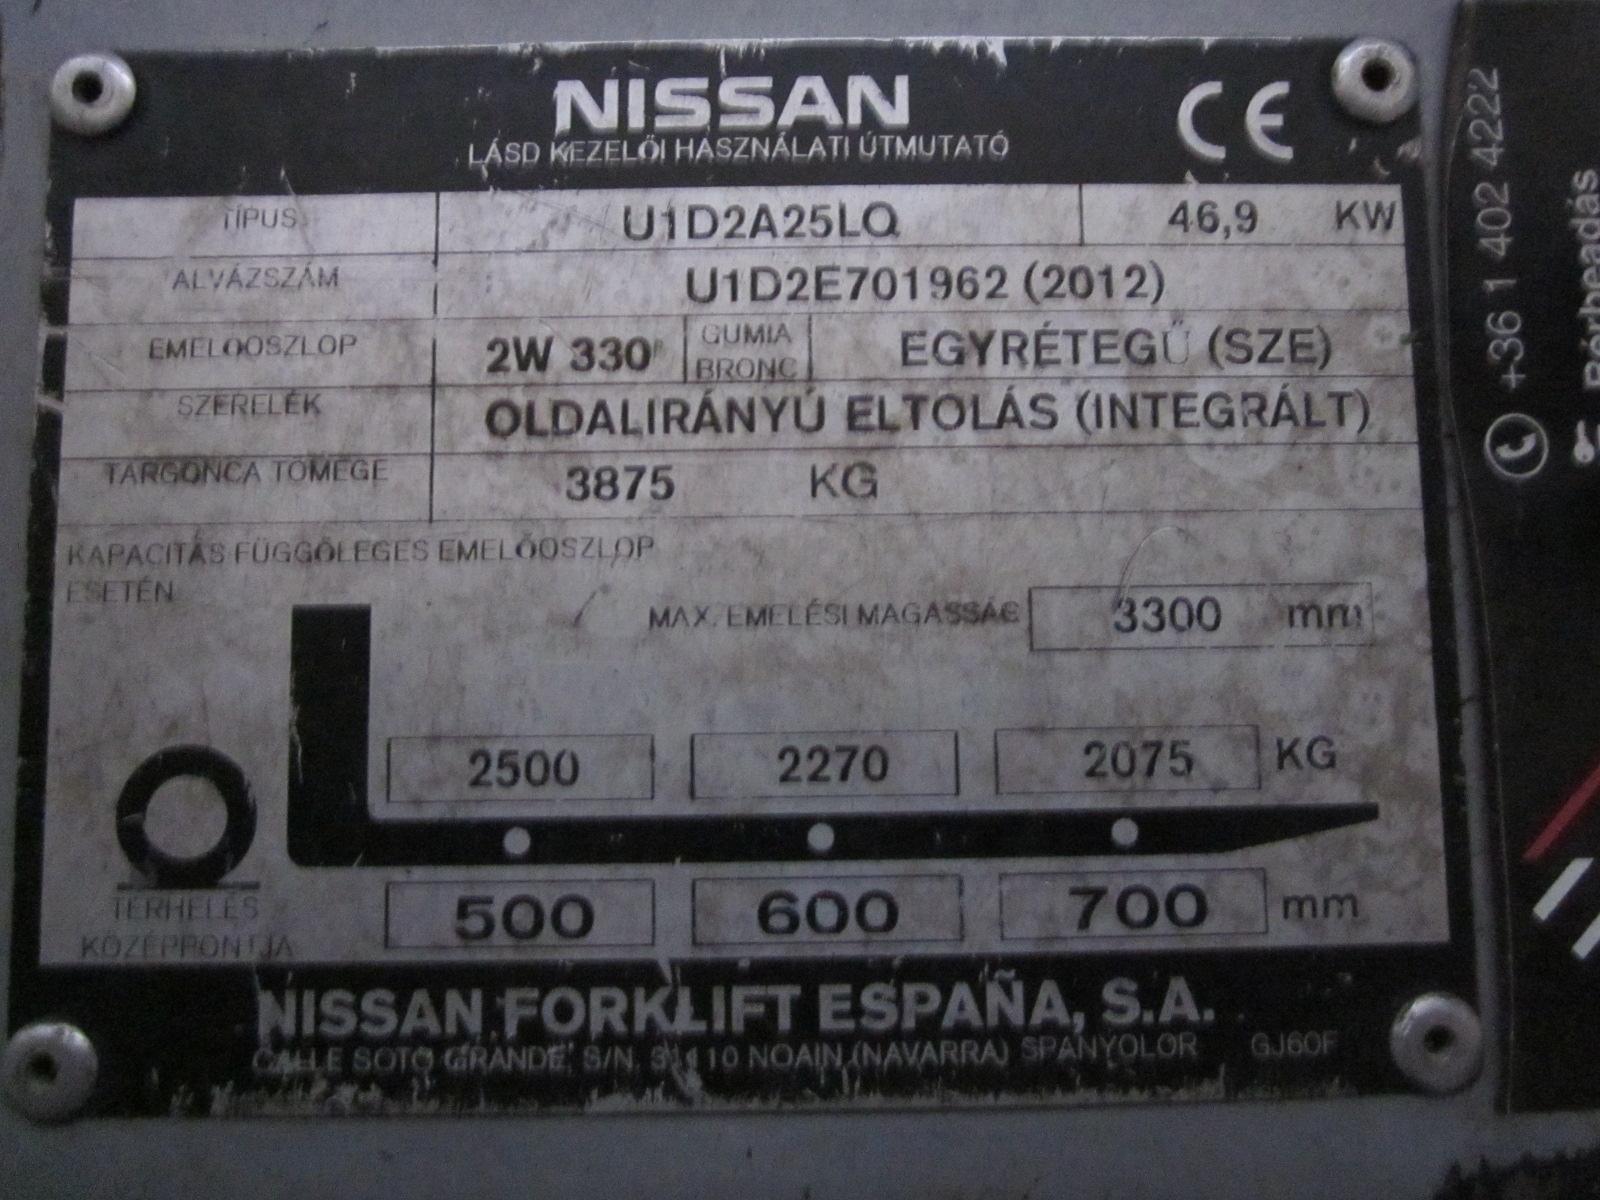 PG254311 Nissan DX25LPG targonca3